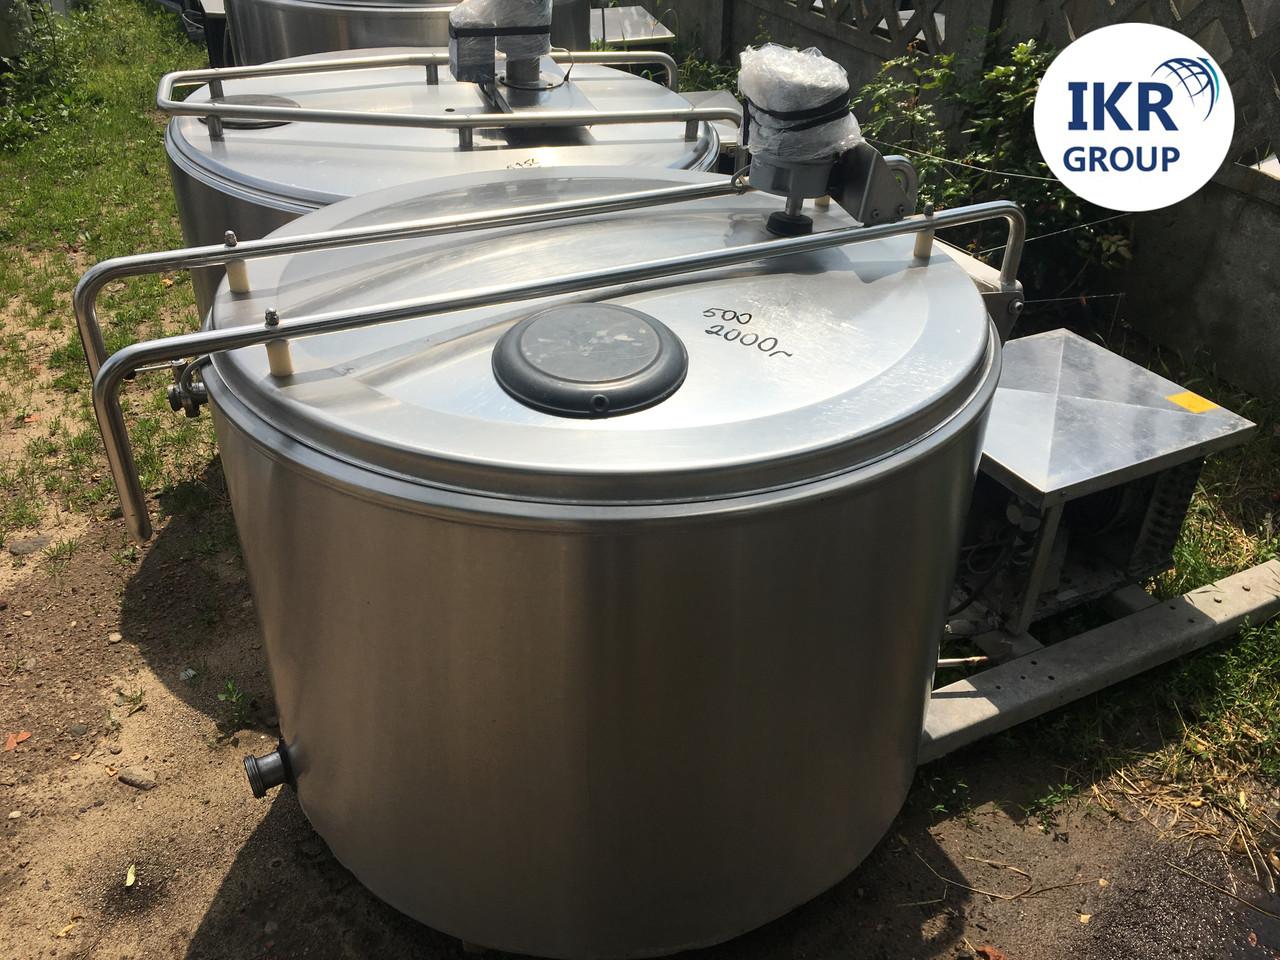 Охладитель молока Б/У ALFA LAVAL 500 открытого типа объёмом 500 литров